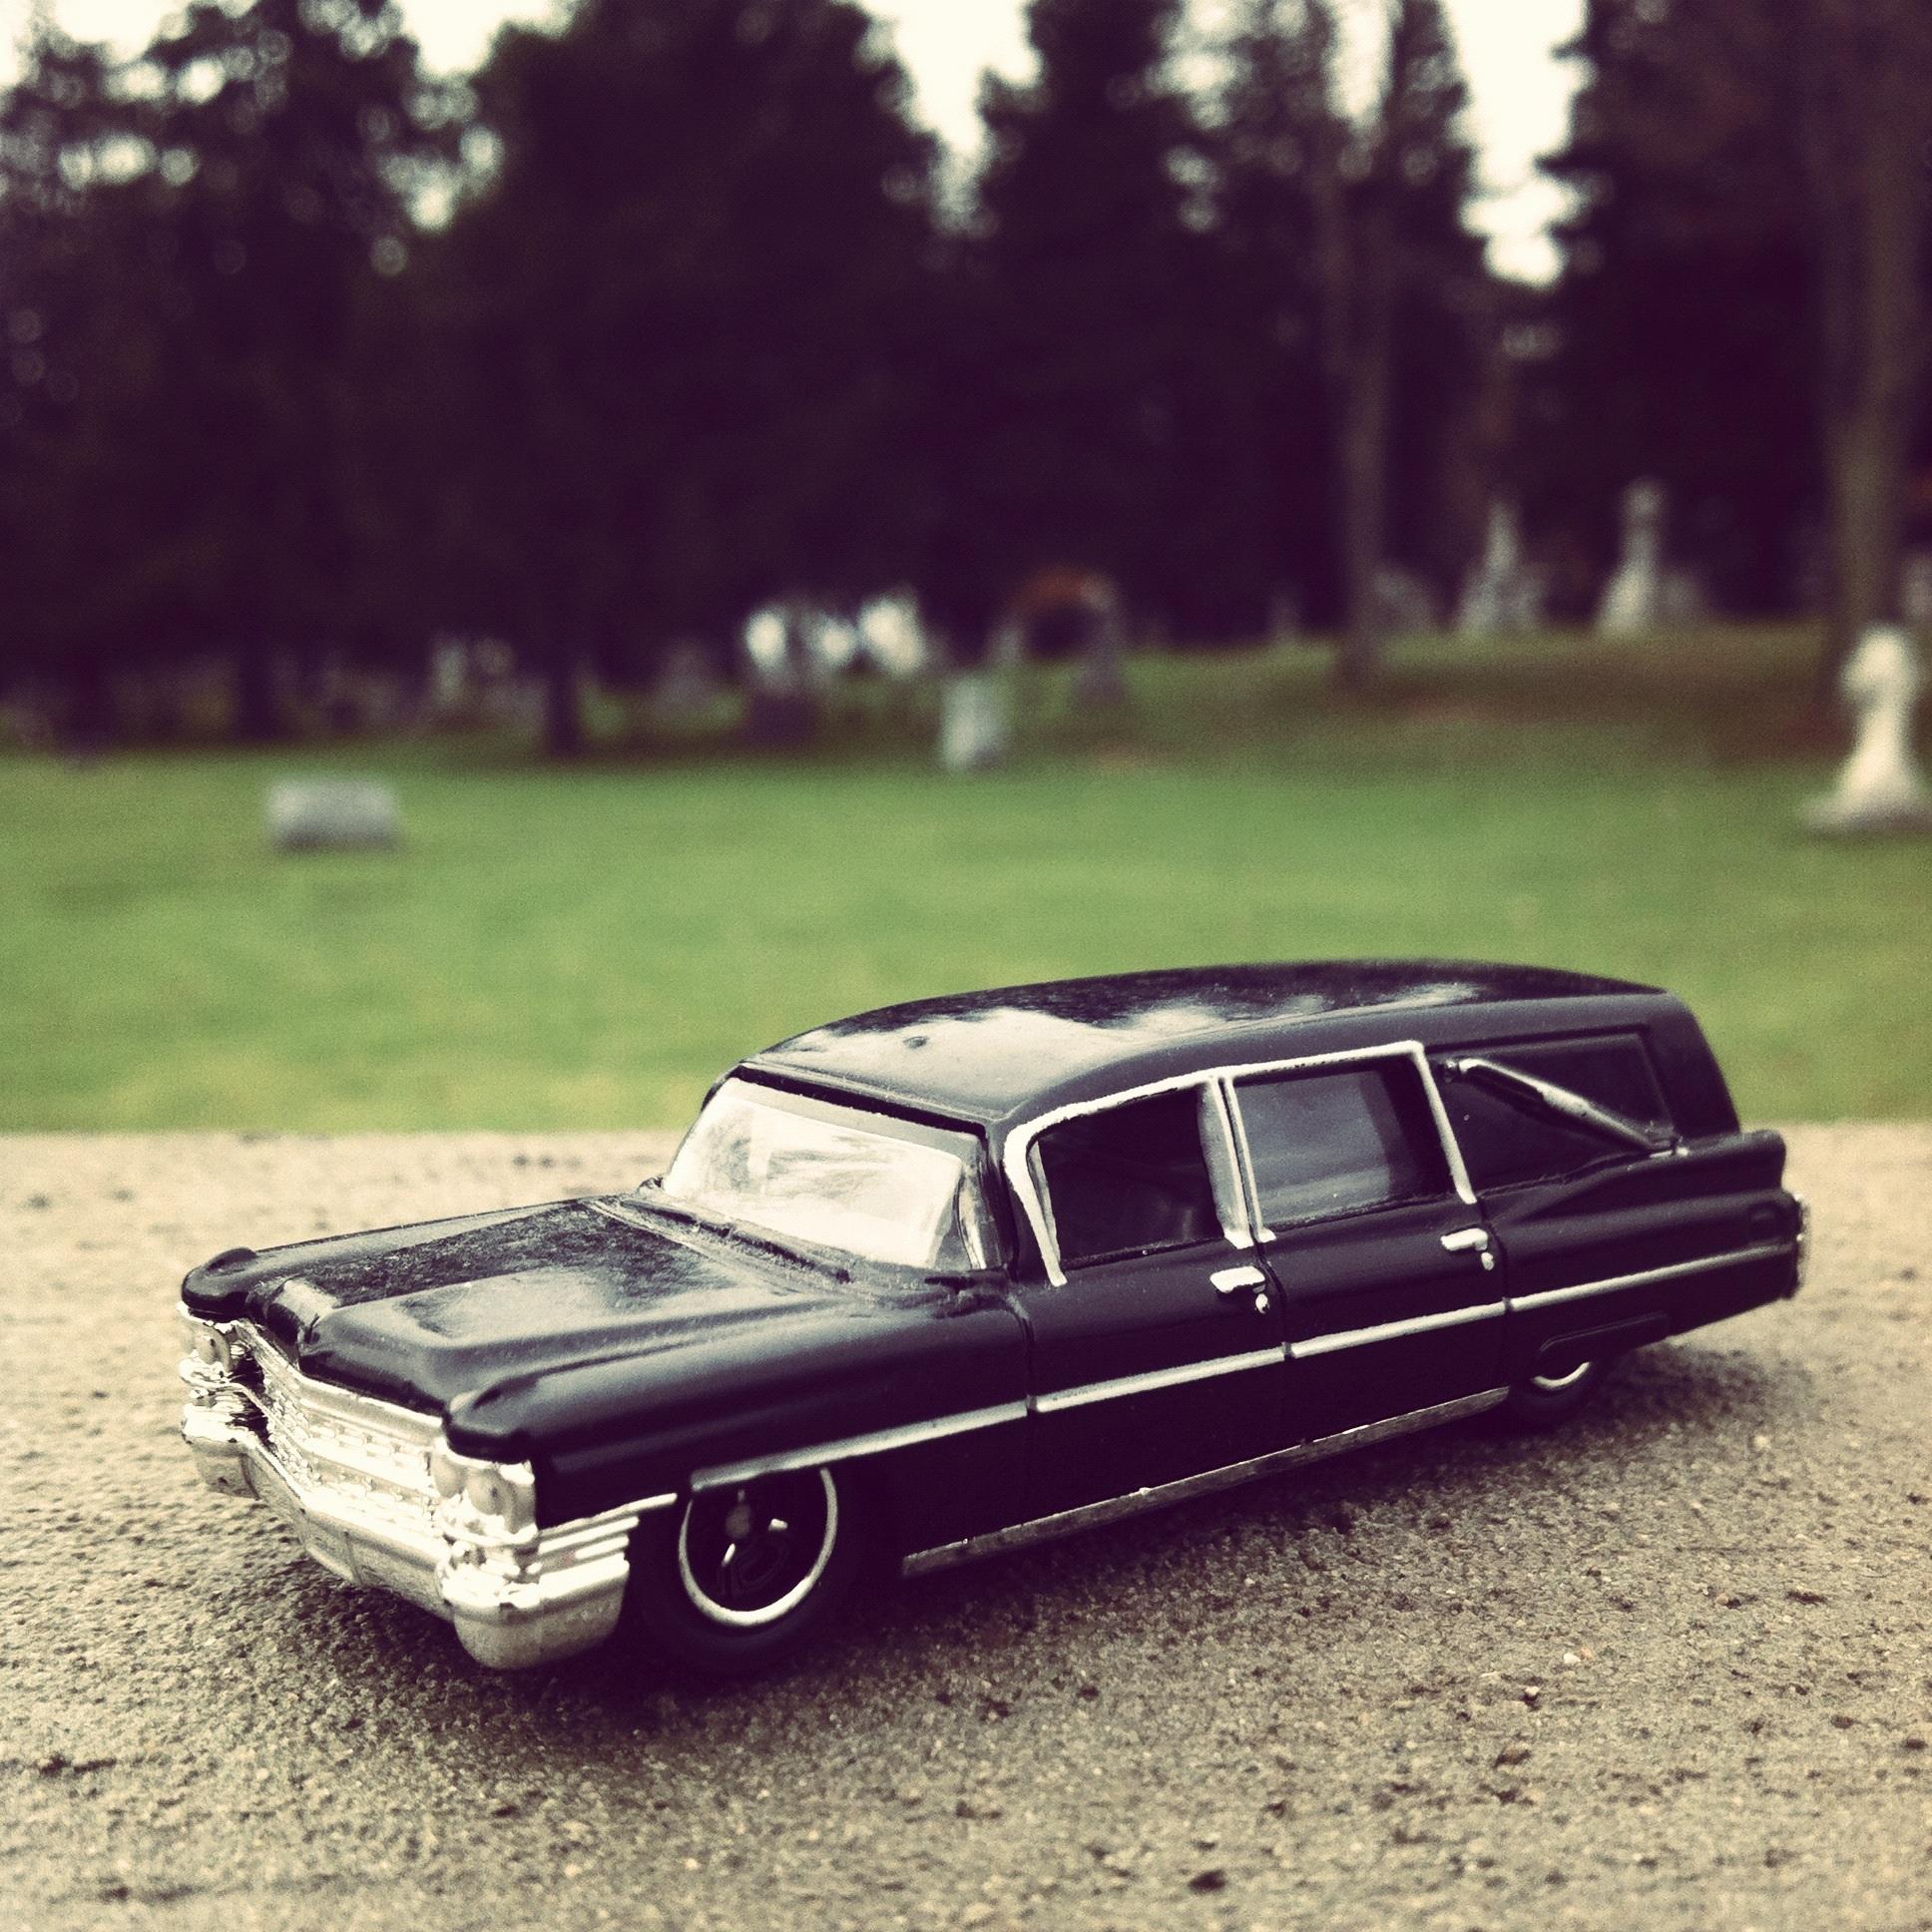 Free Images Cemetery Black Vintage Car Sad Graveyard Sedan